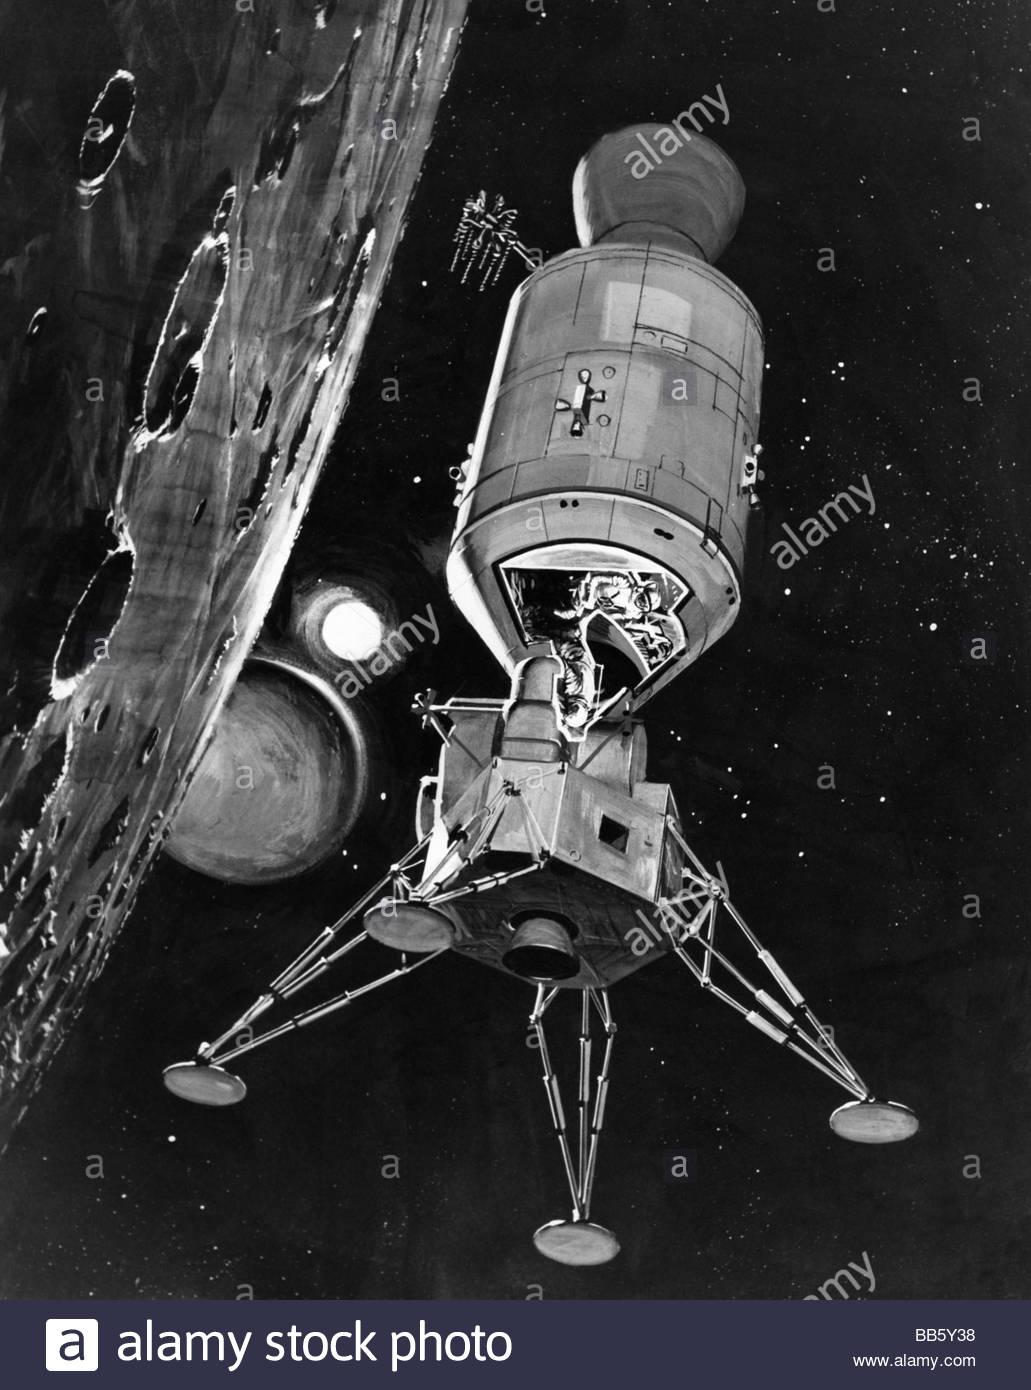 luna spacecraft drawings - photo #6